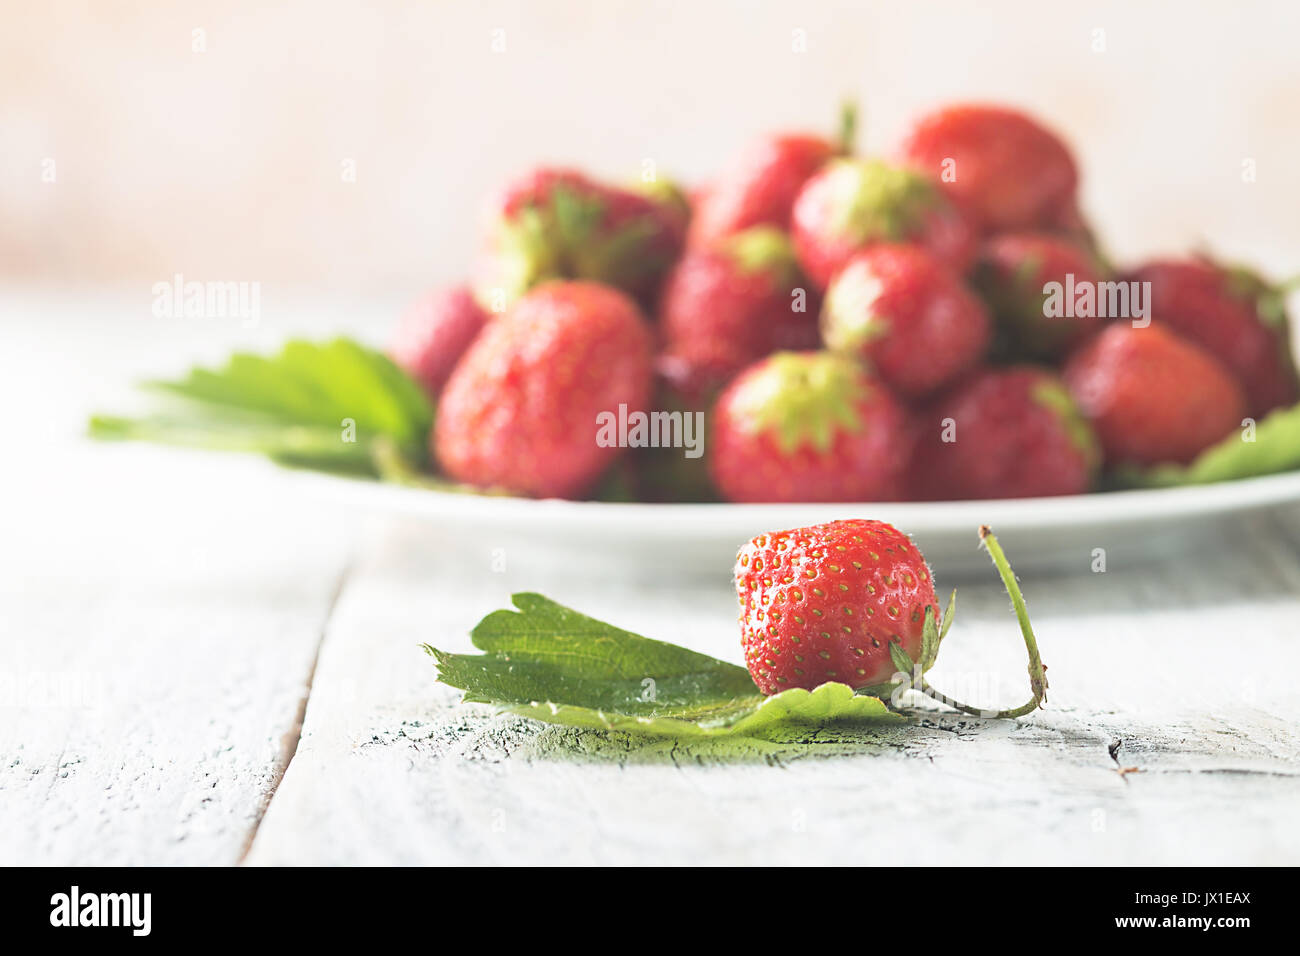 Heap of fresh strawberries - Stock Image